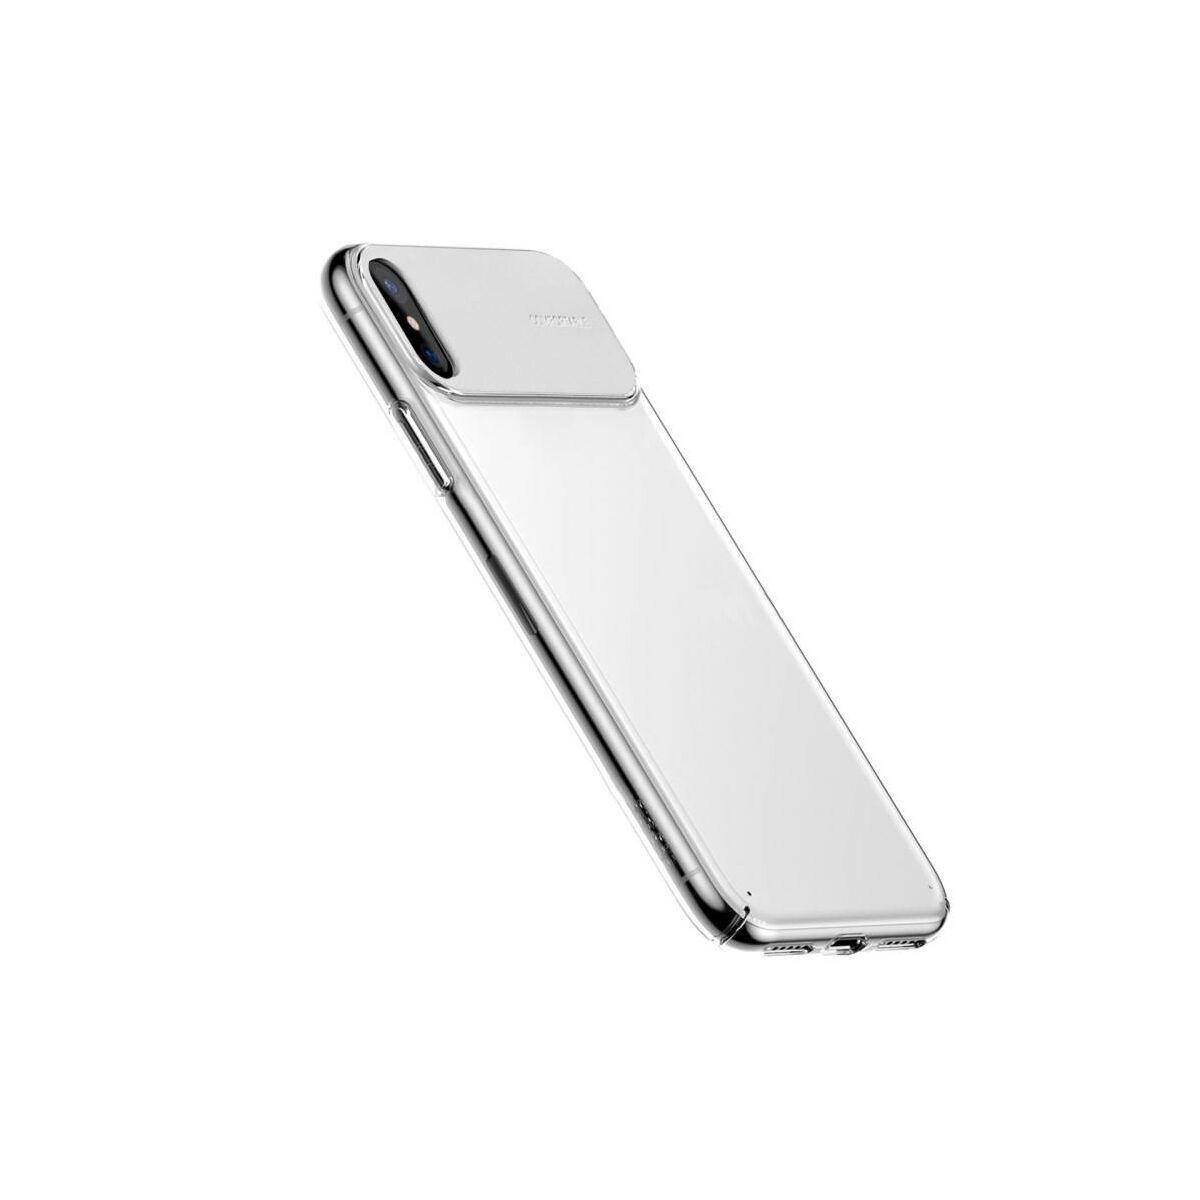 Baseus iPhone XS Max tok, Comfortable, fehér (WIAPIPH65-SS02)